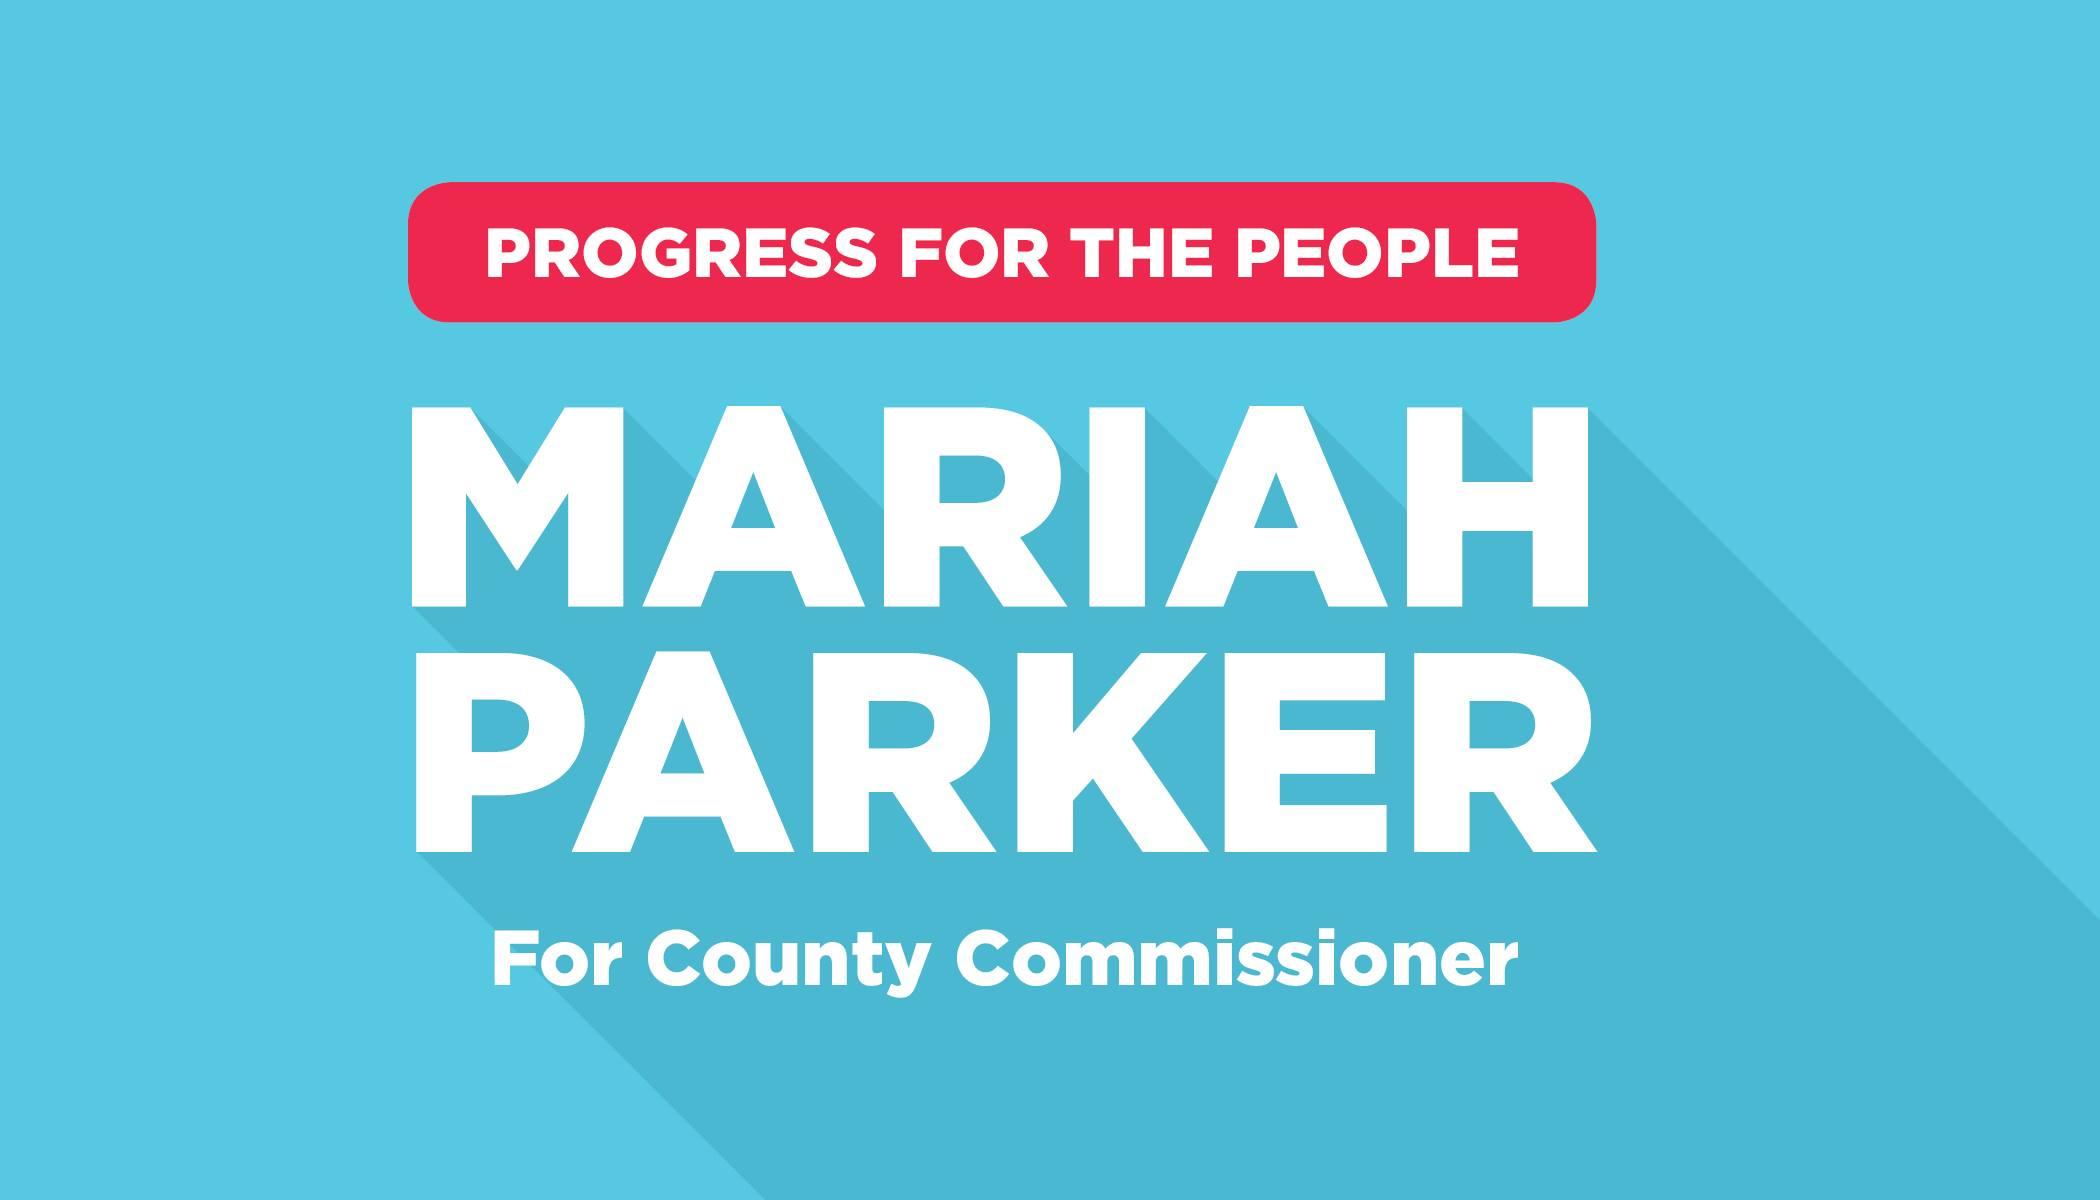 Mariah Parker